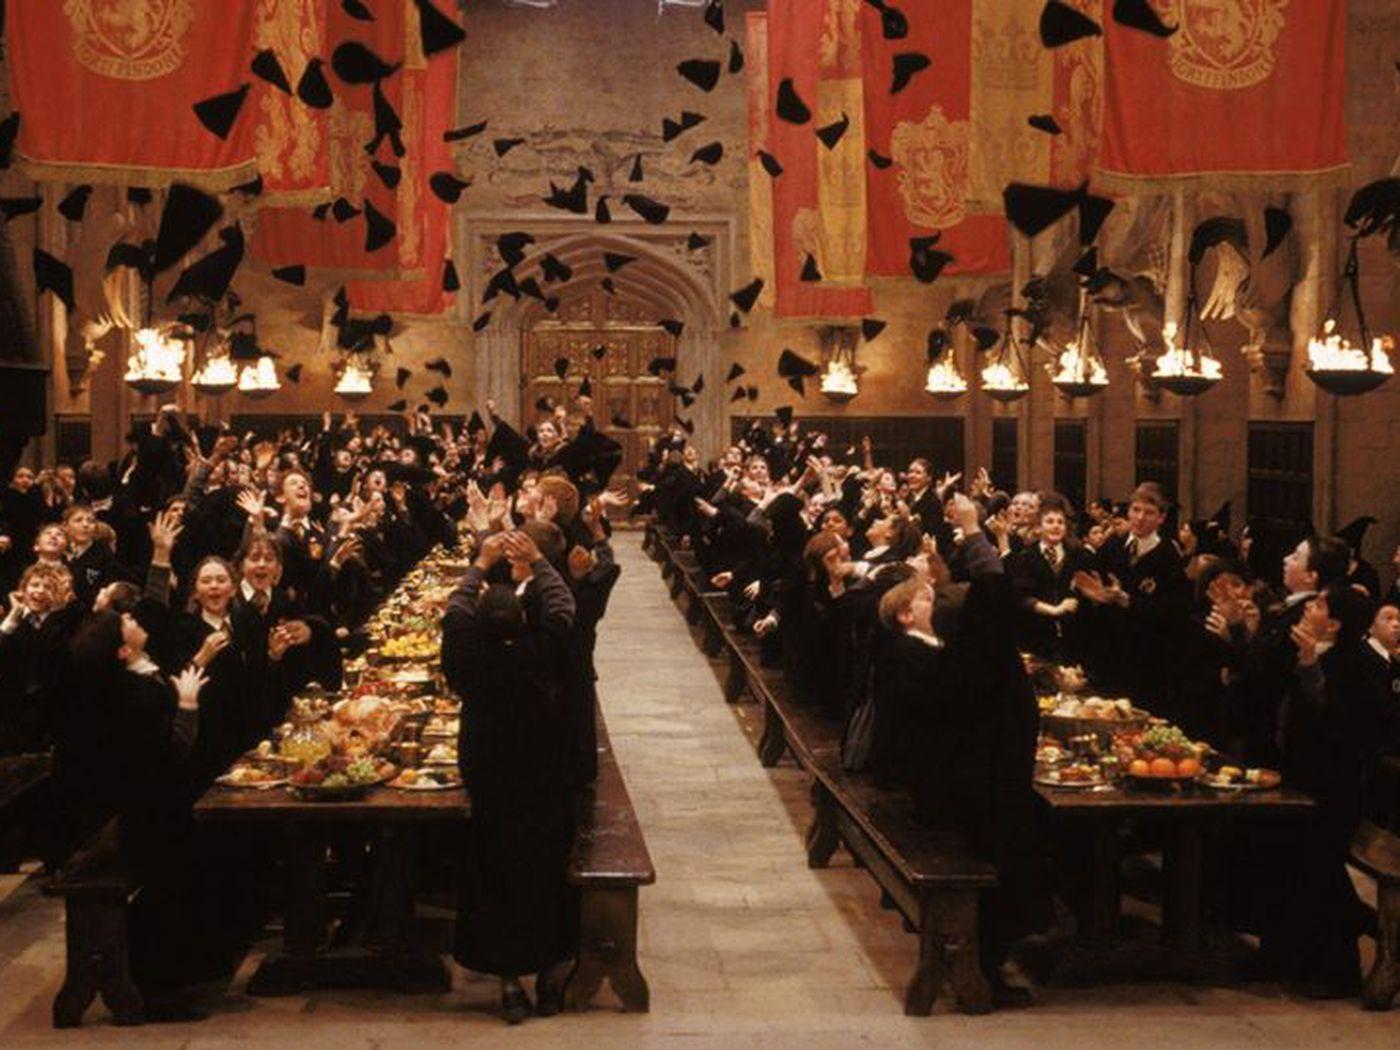 An online Hogwarts escape room has been designed for Harry Potter fans, The Manc